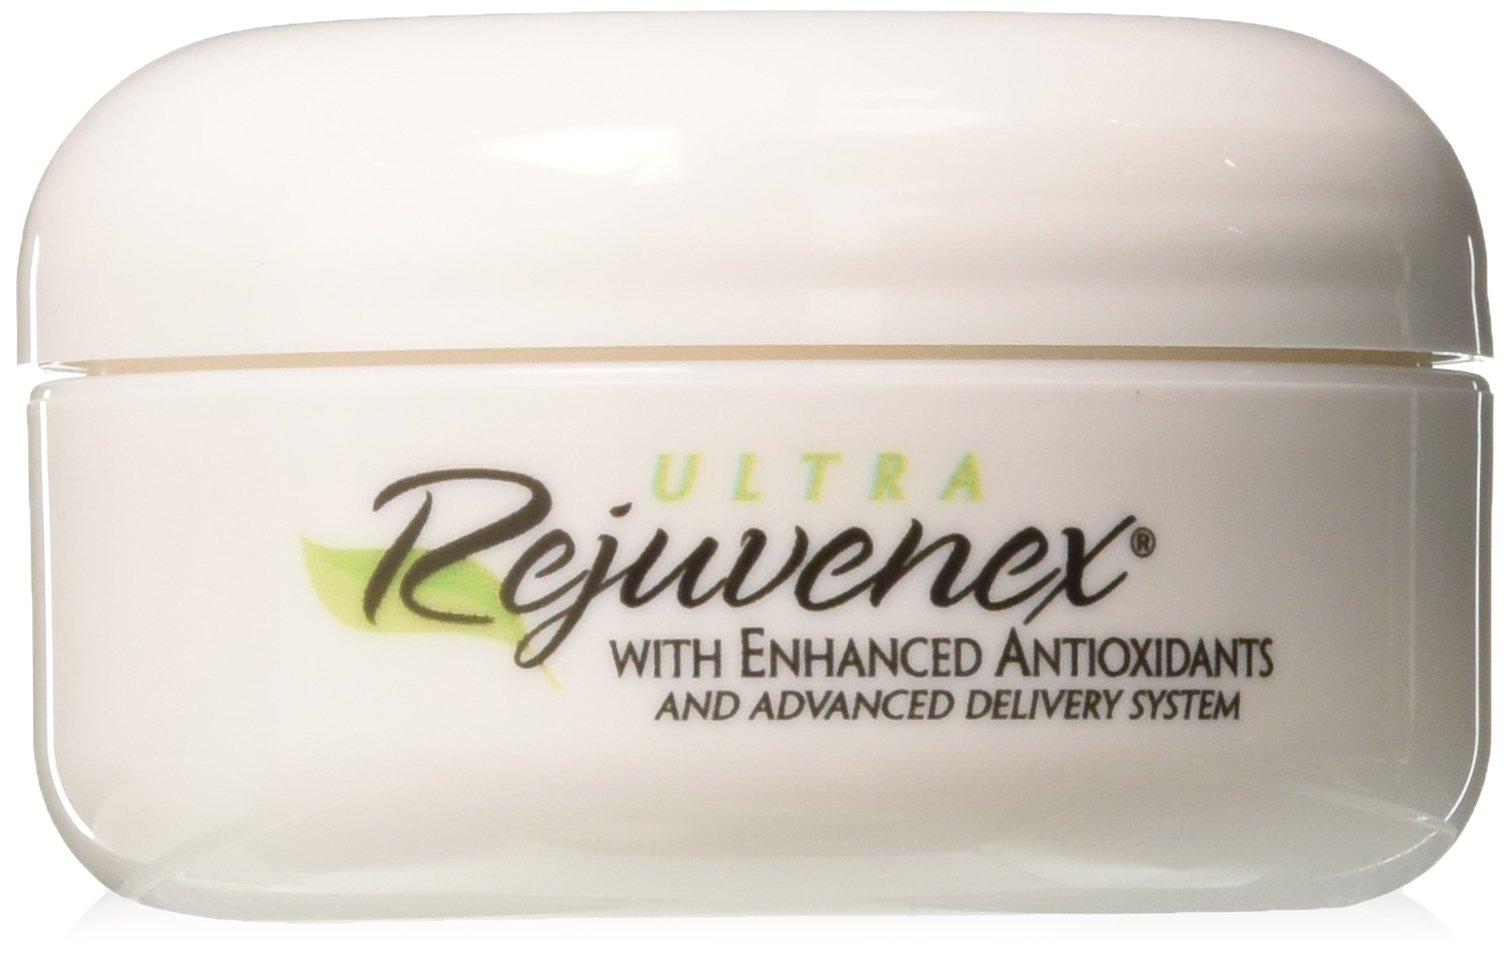 Life Extension Rejuvenex Factor Firming Serum 1.7 Oz., Pack of 2 Now Foods - Solutions, CoQ10 Antioxidant Serum, 1 fl oz (30 ml), Pack of 2